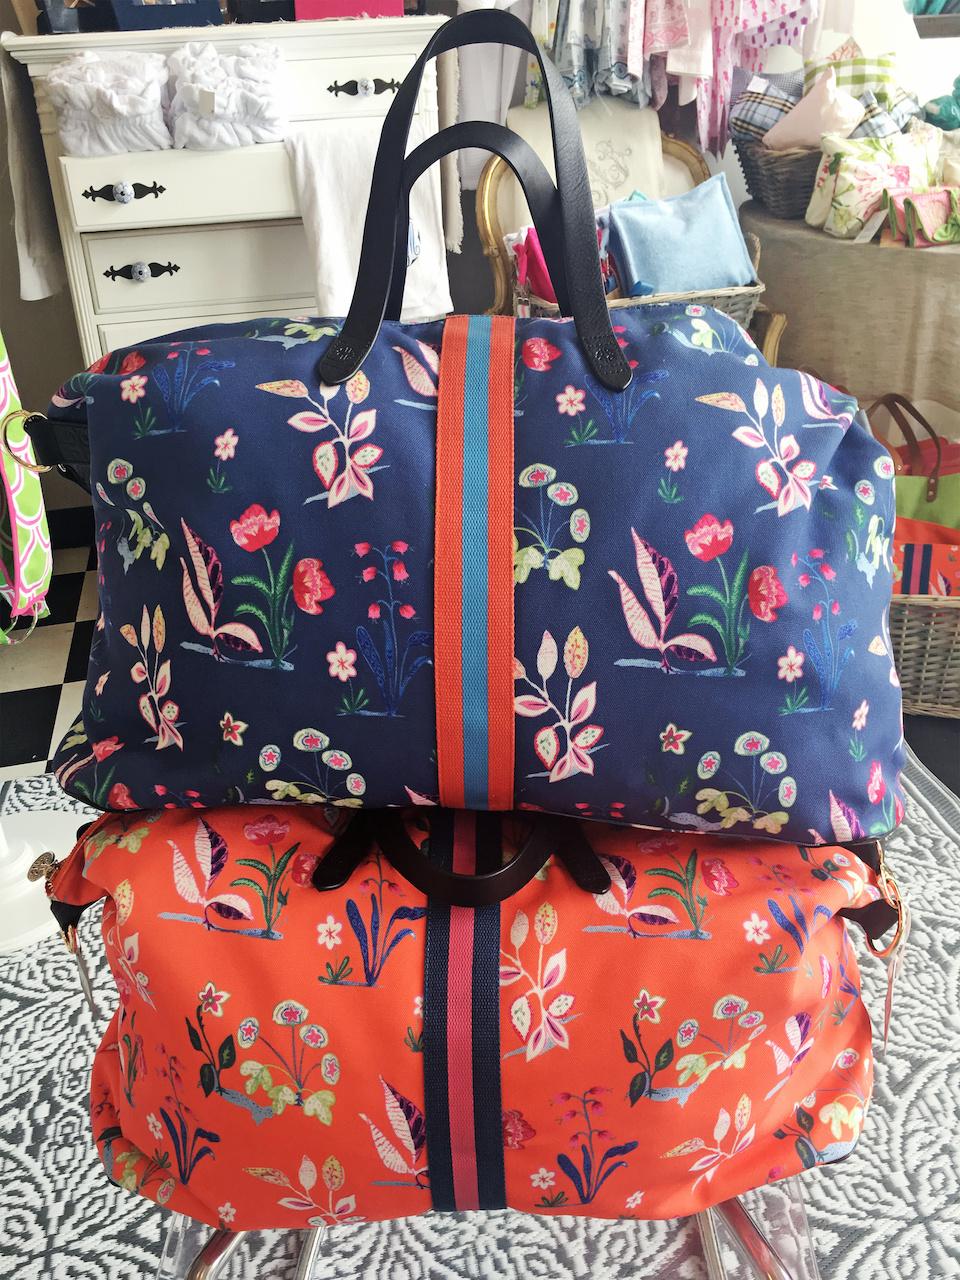 Pomegranate Inc. weekender bag, $170 each, at B. Bayer & Co. Monogramming & Gifts